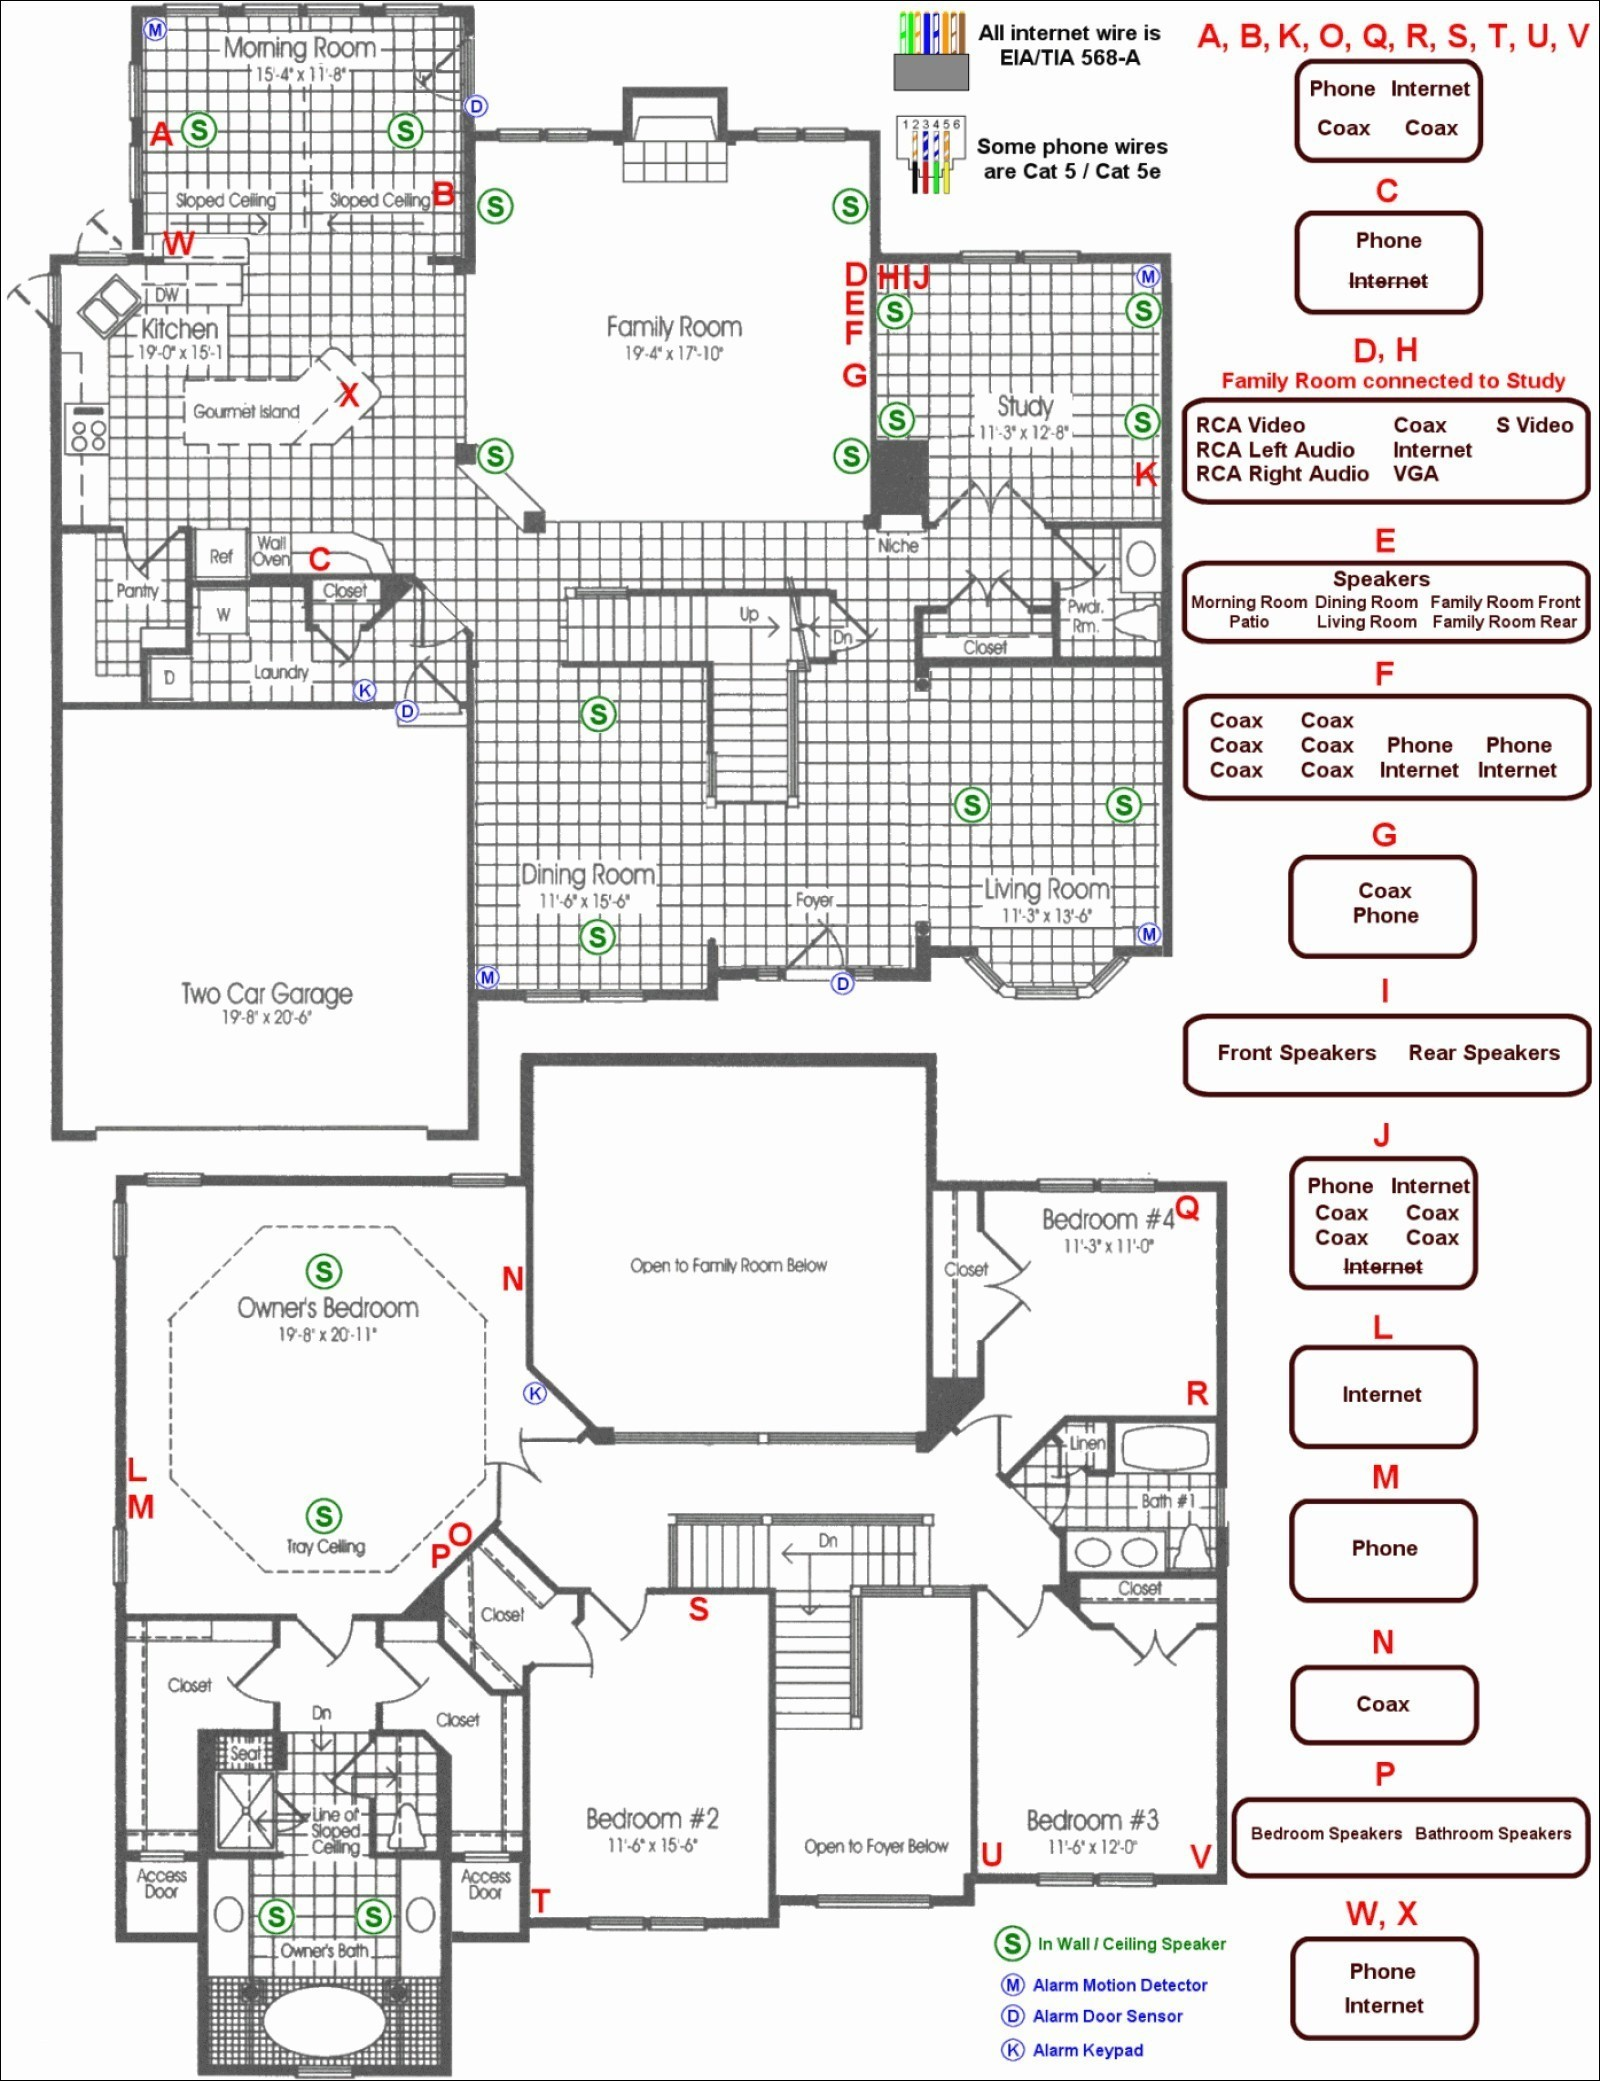 Ge Refrigerator Wiring Diagram Simple Home Electrical Wiring Diagrams